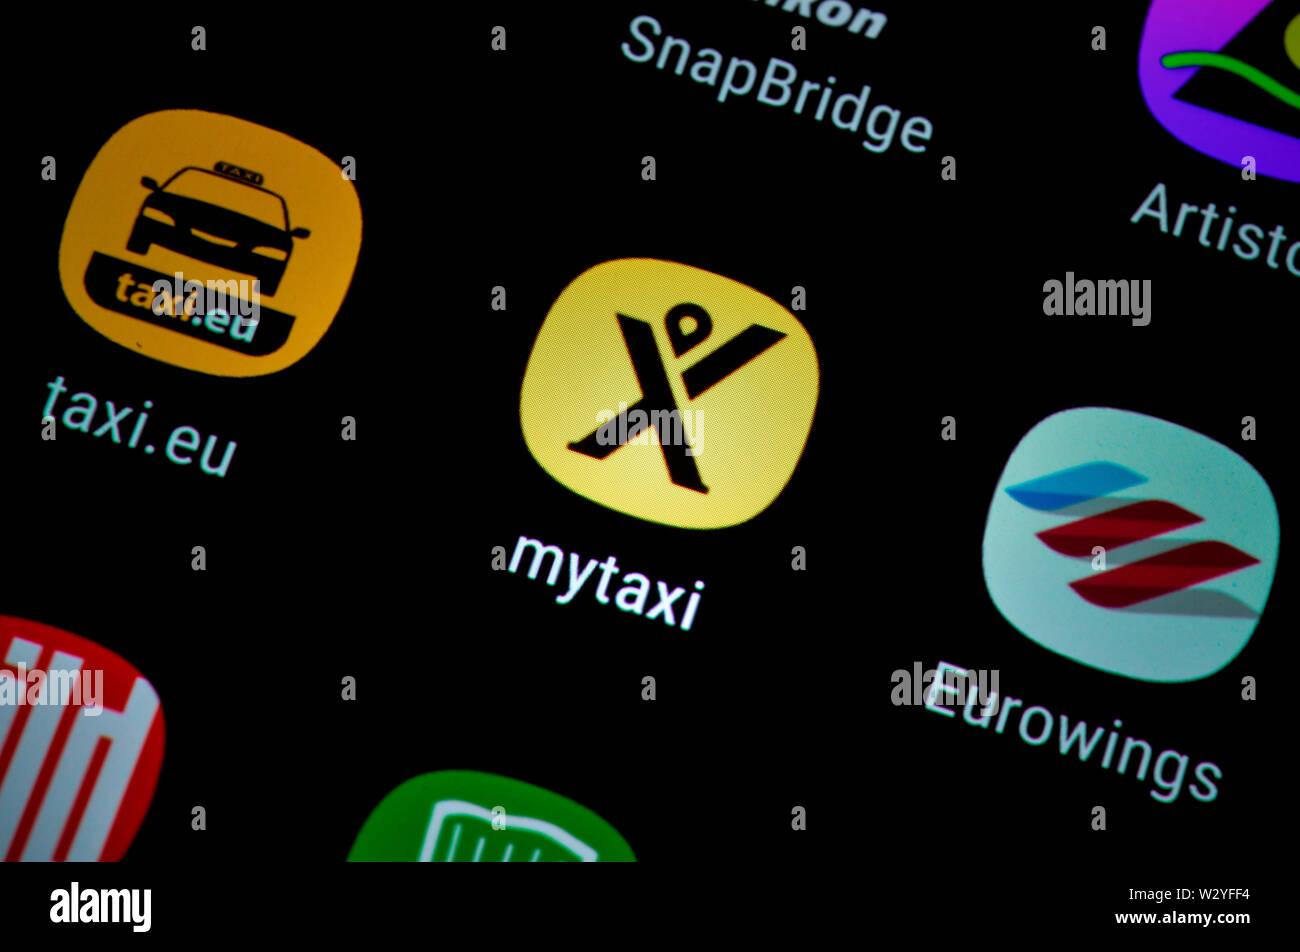 Smartphone, Display, App, mytaxi - Stock Image